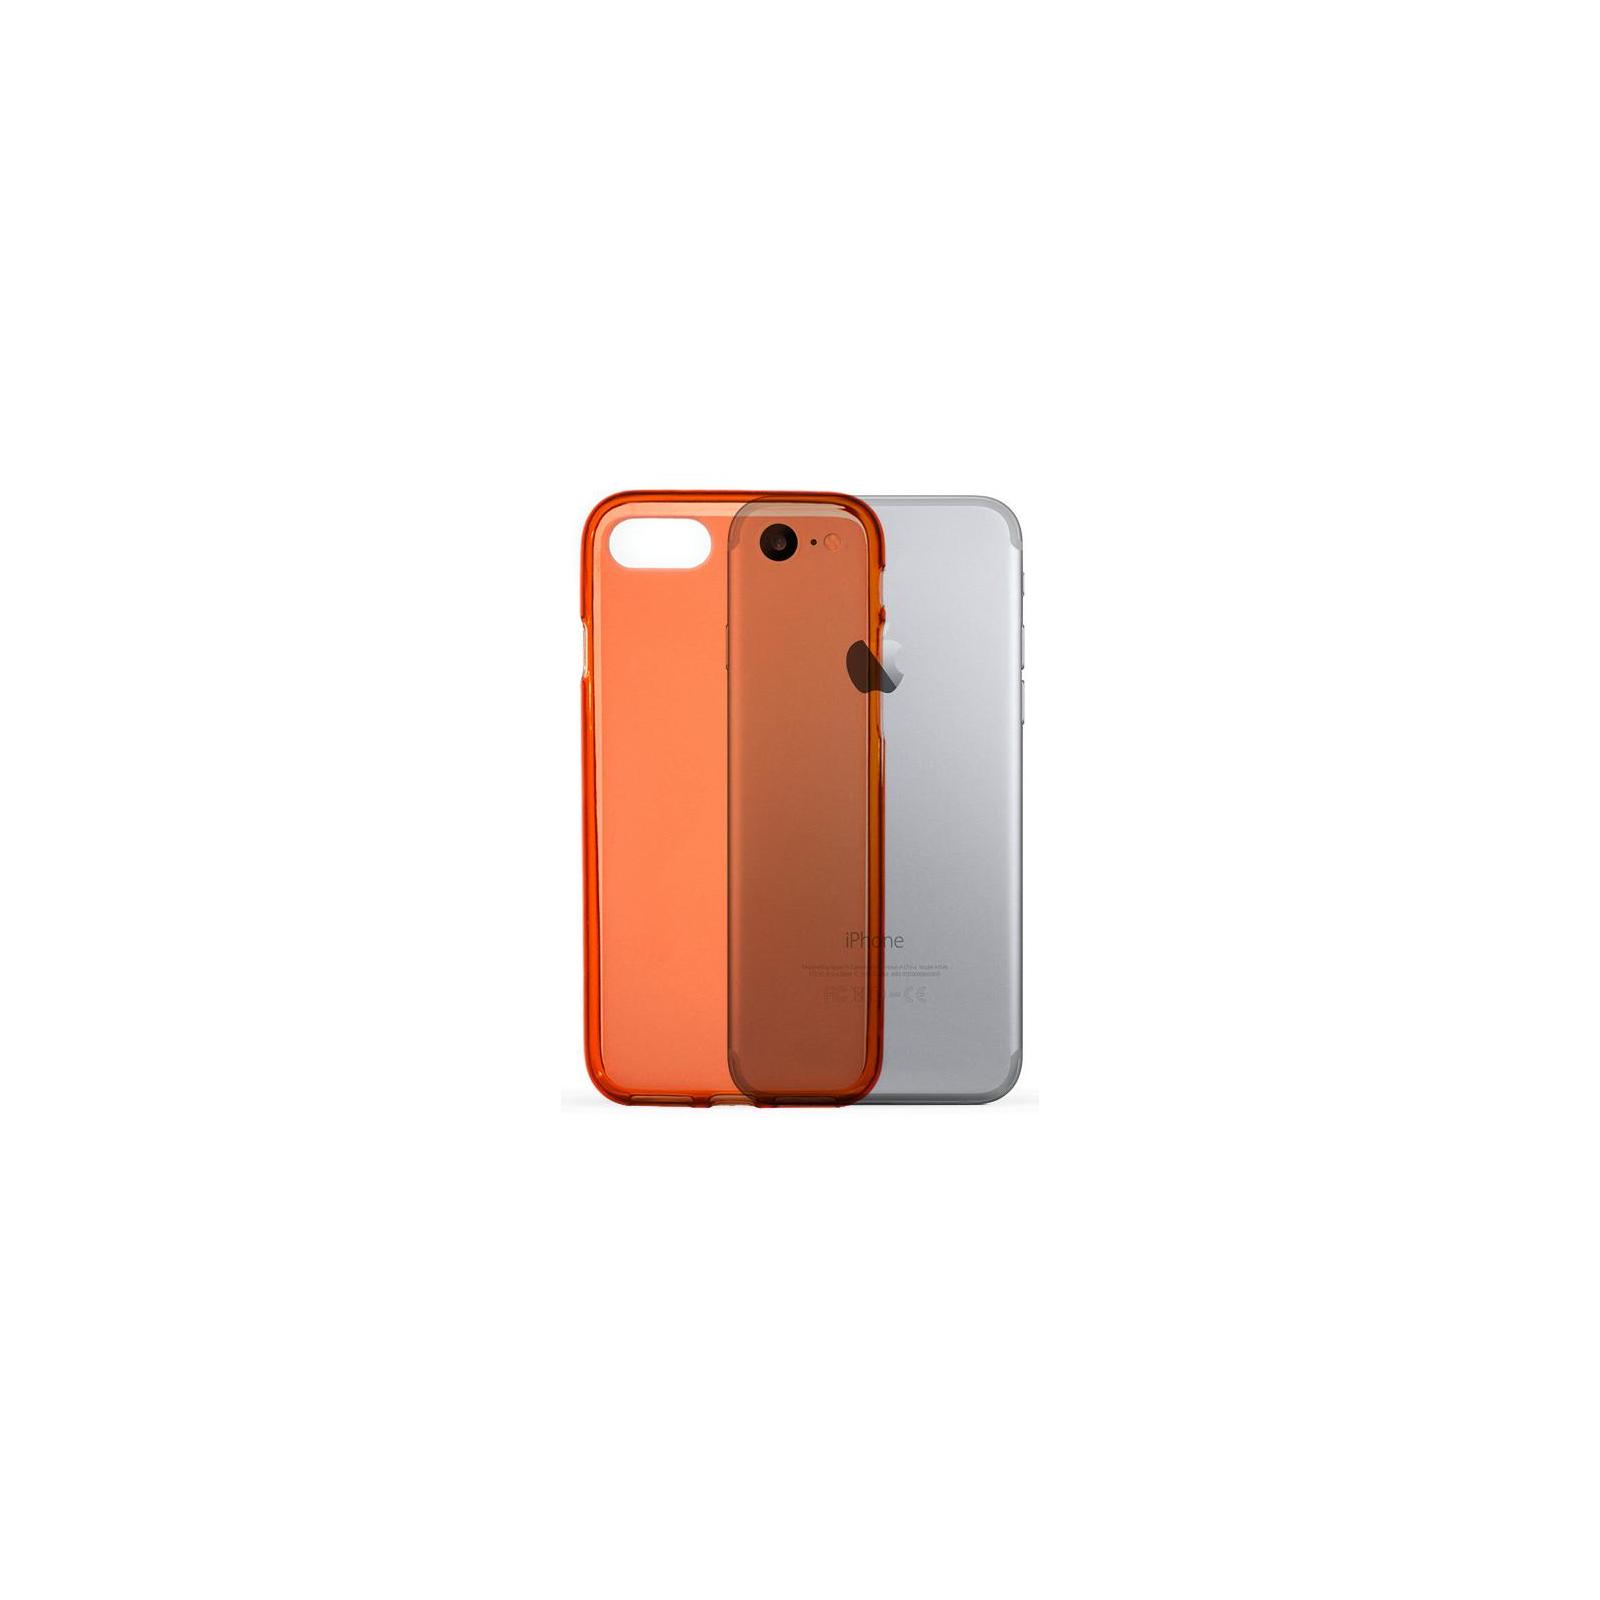 Чехол для моб. телефона Colorway TPU case for Apple iPhone 7/8, red (CW-CTPAI7-RD) изображение 2